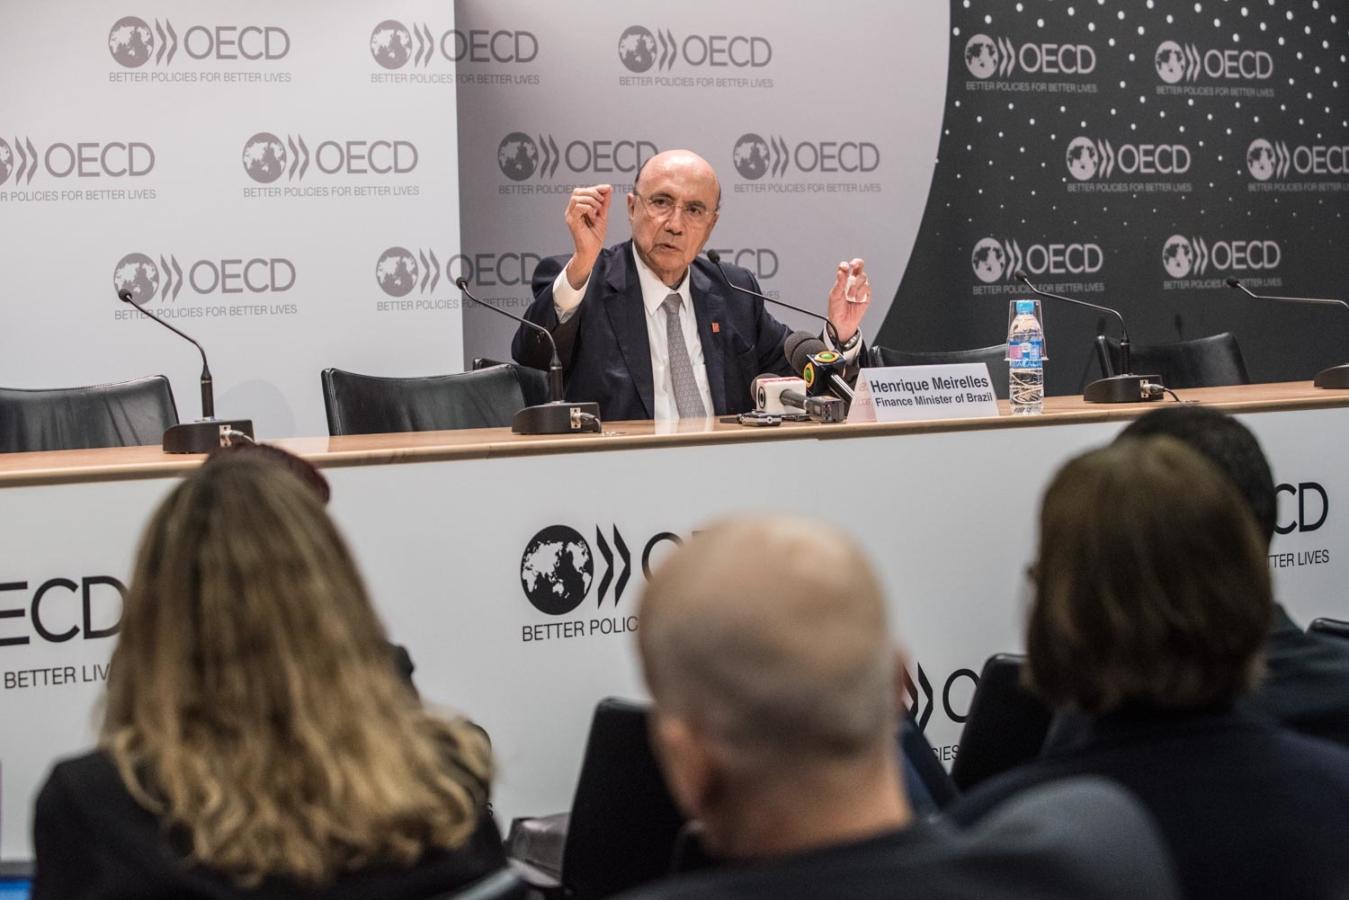 7 June 2017 - OECD Week – Press Briefing with Henrique Meirelles, Minister of Trade, Brazil.                           Photo: OECD/Hubert Raguet